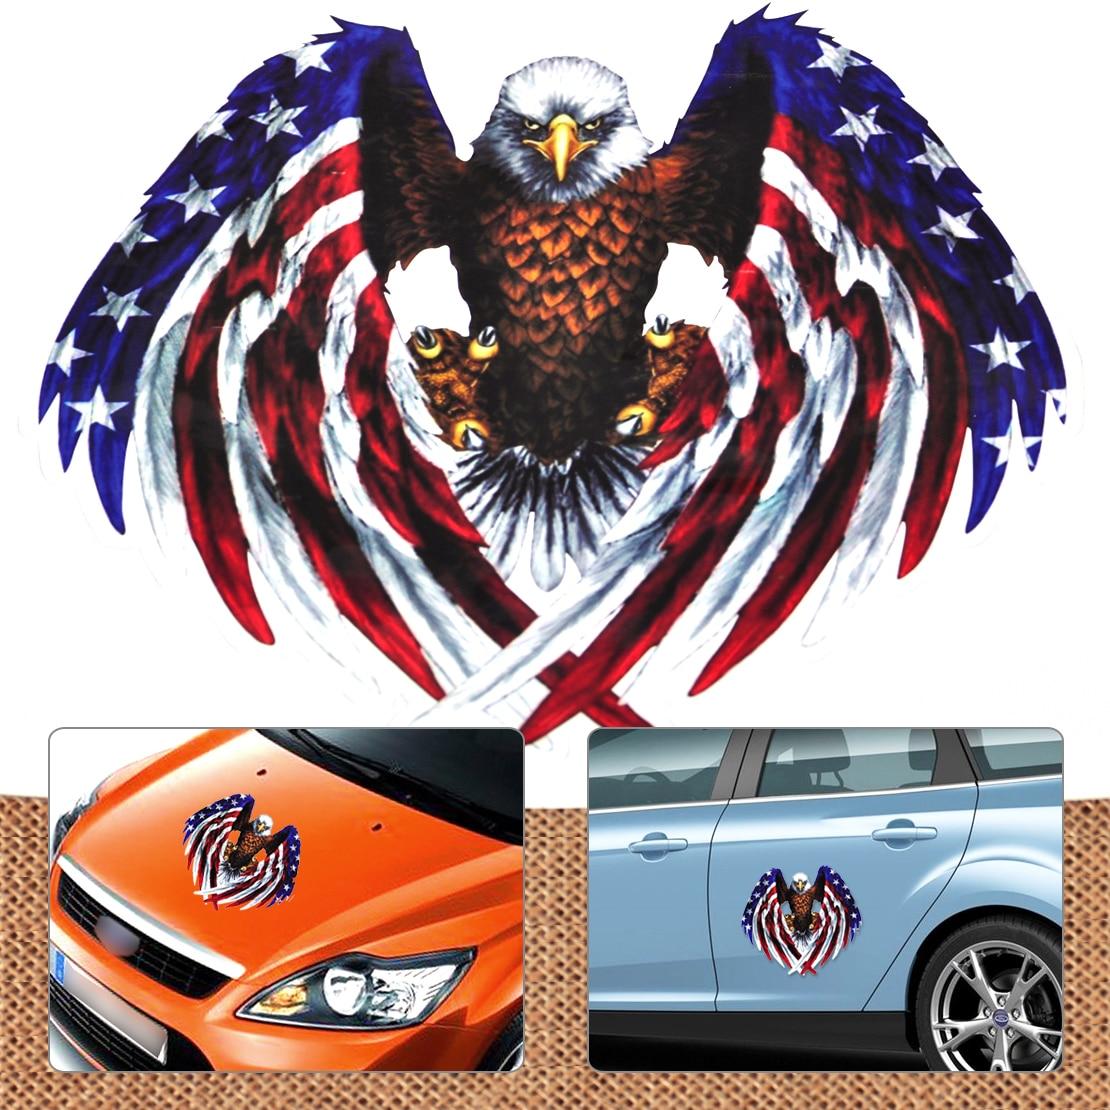 Car sticker eagle - Car Bumper Bike Laptop Window American United States Usa Flag Eagle Style Sticker For Vw Audi